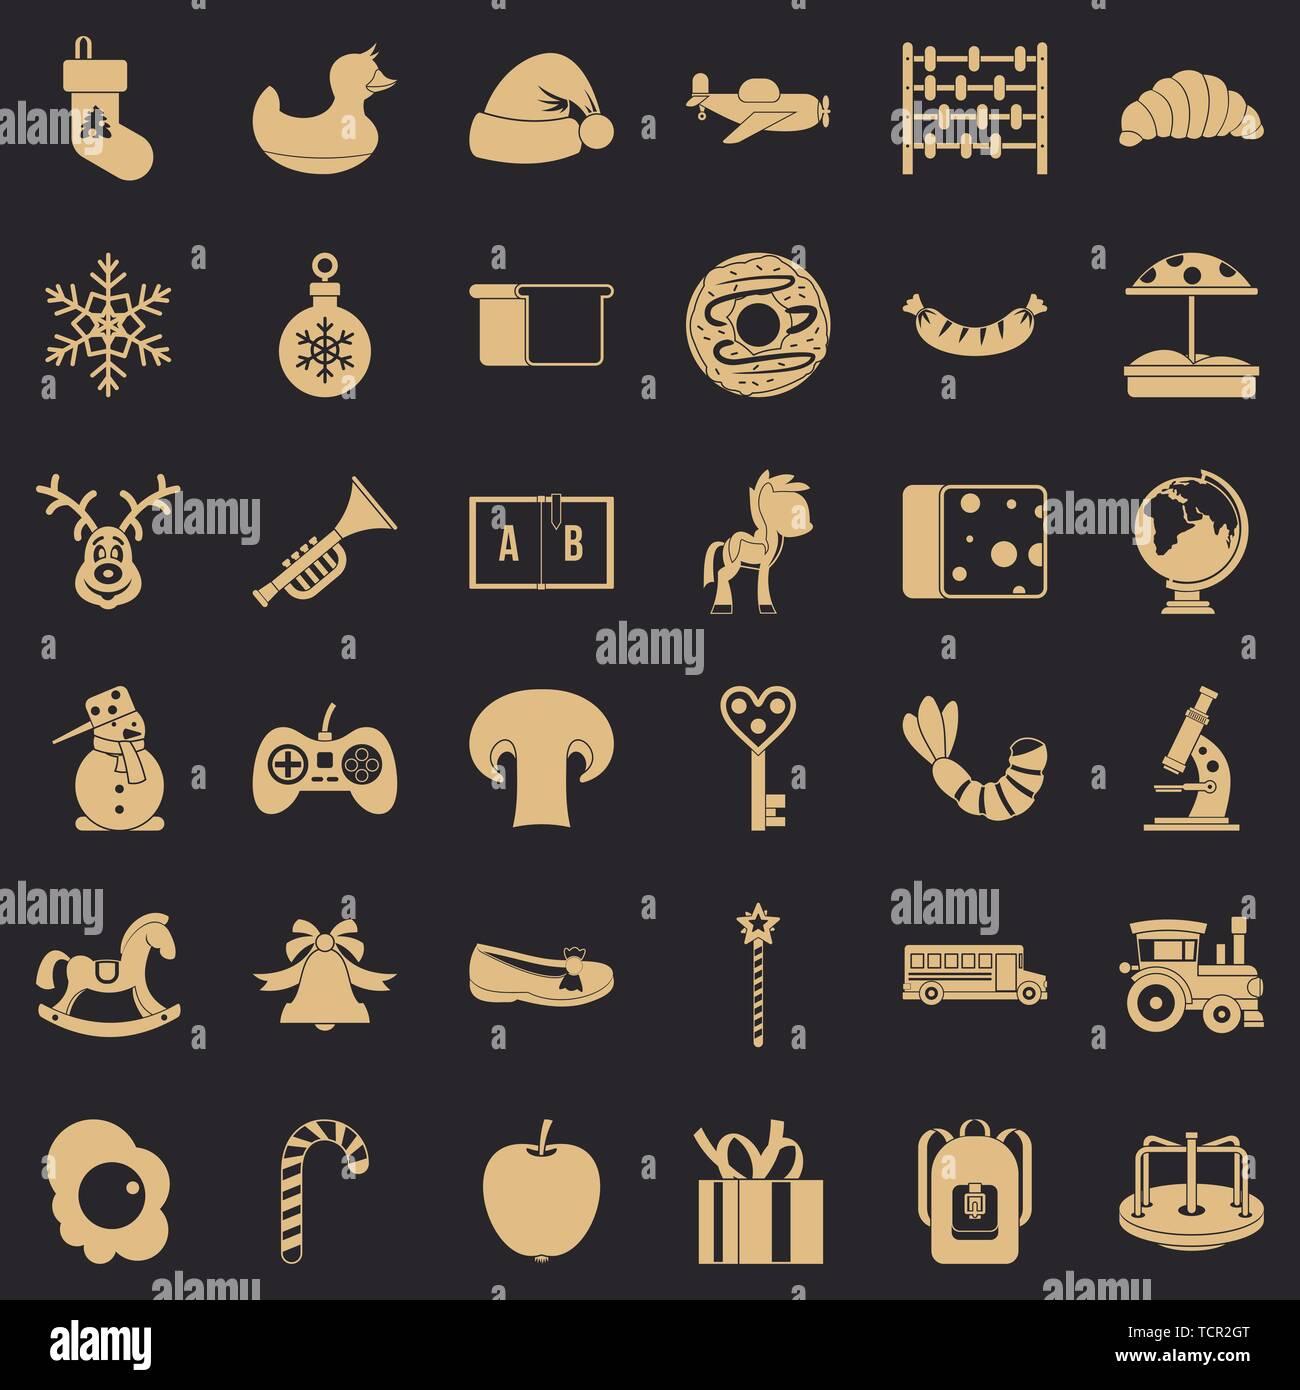 Kindergarten icons set, simple style - Stock Image